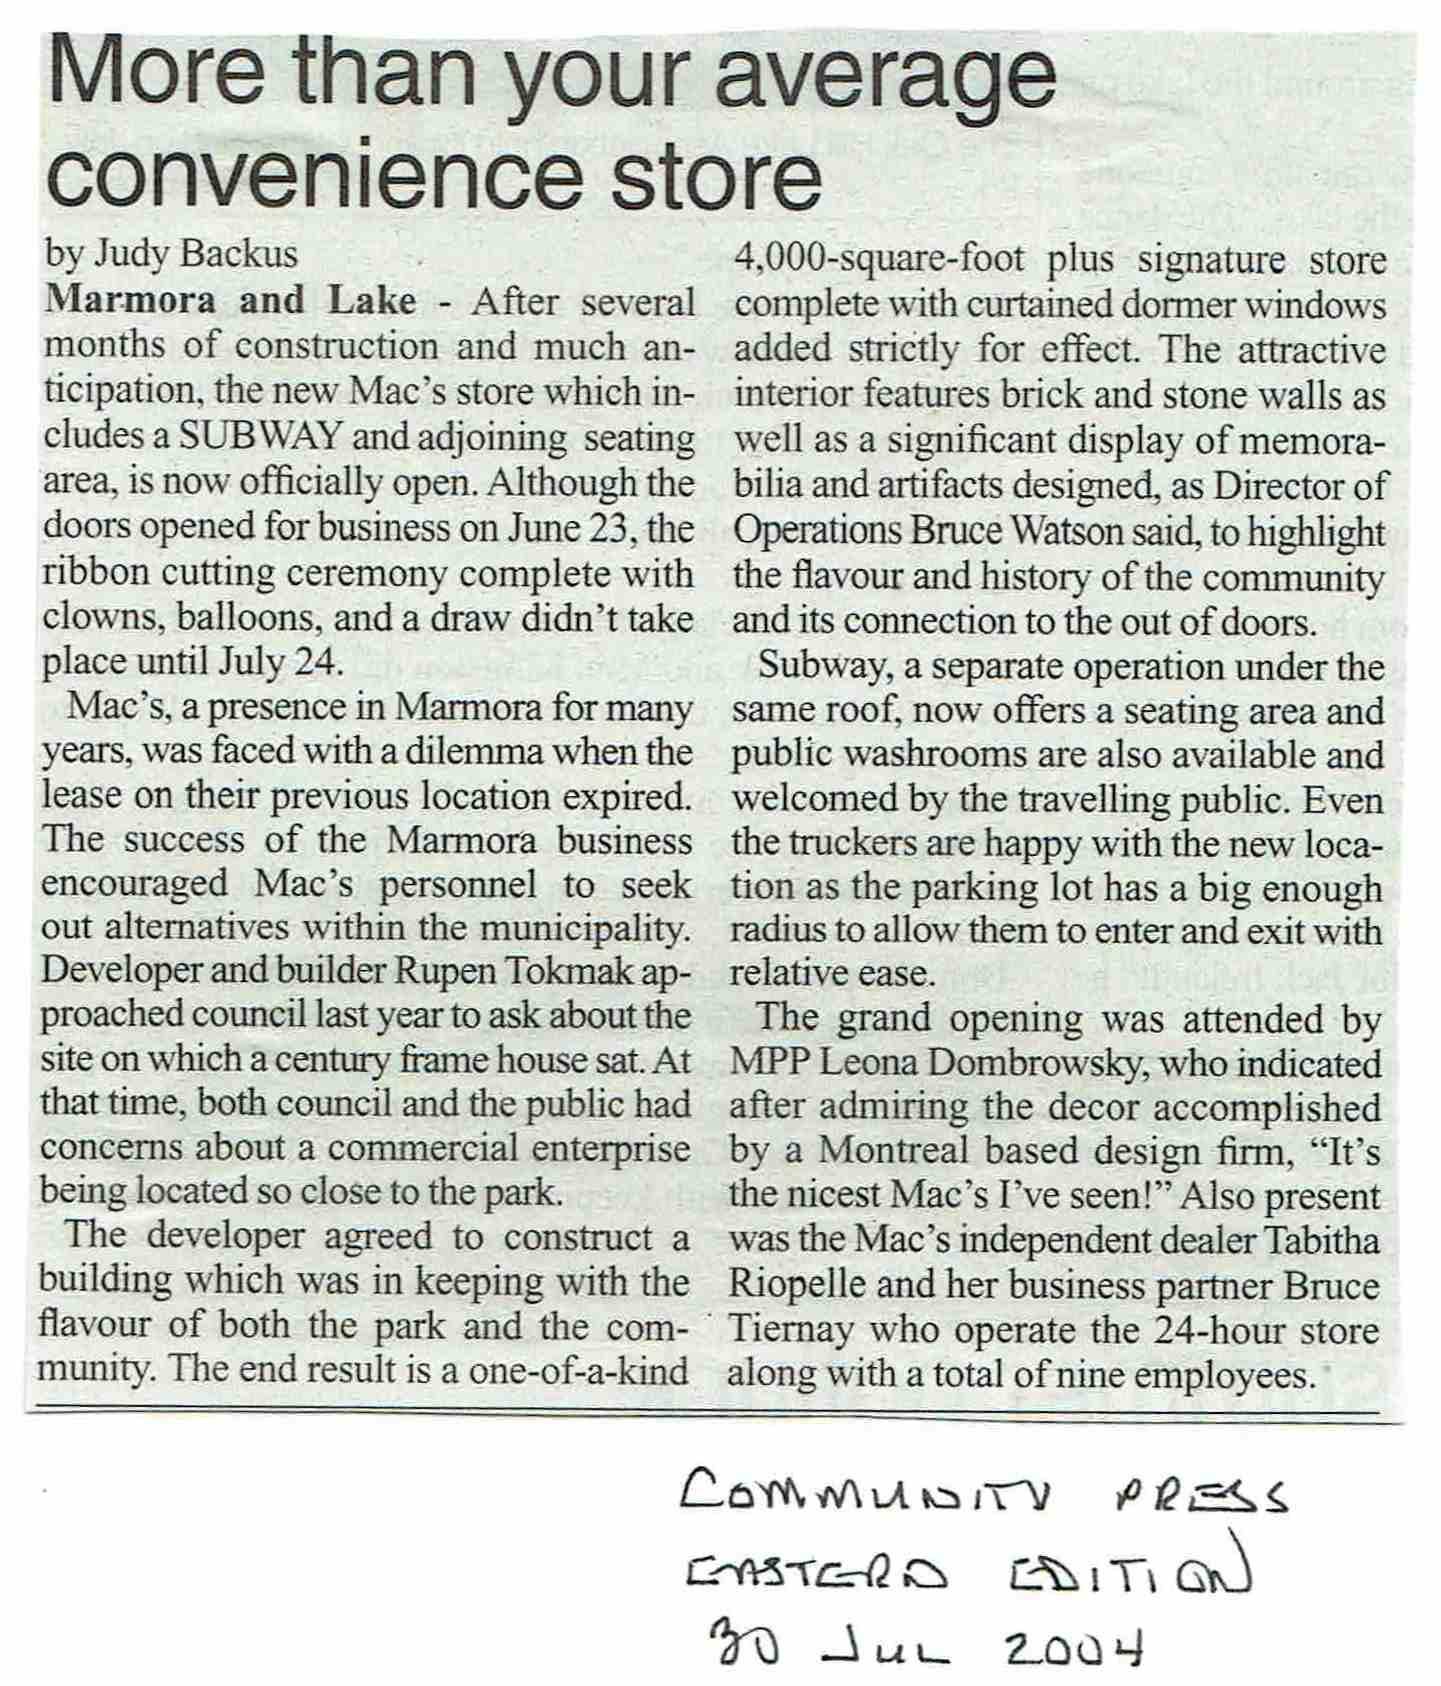 2004 New Macs Store.JPG